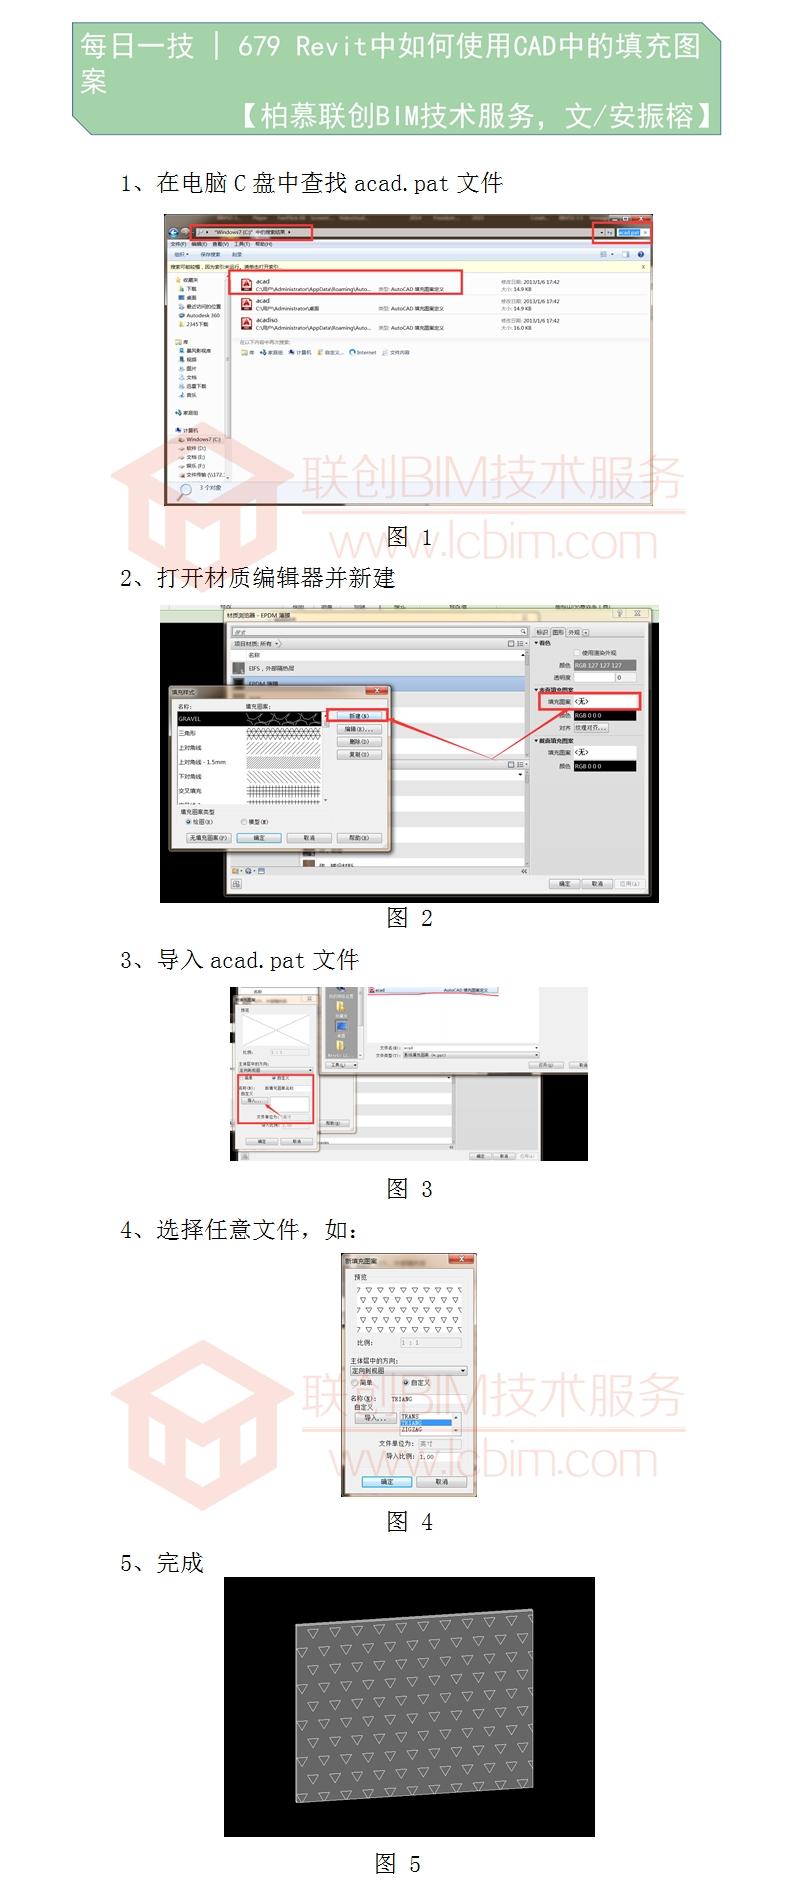 679 Revit中如何使用CAD中的填充图案.jpg